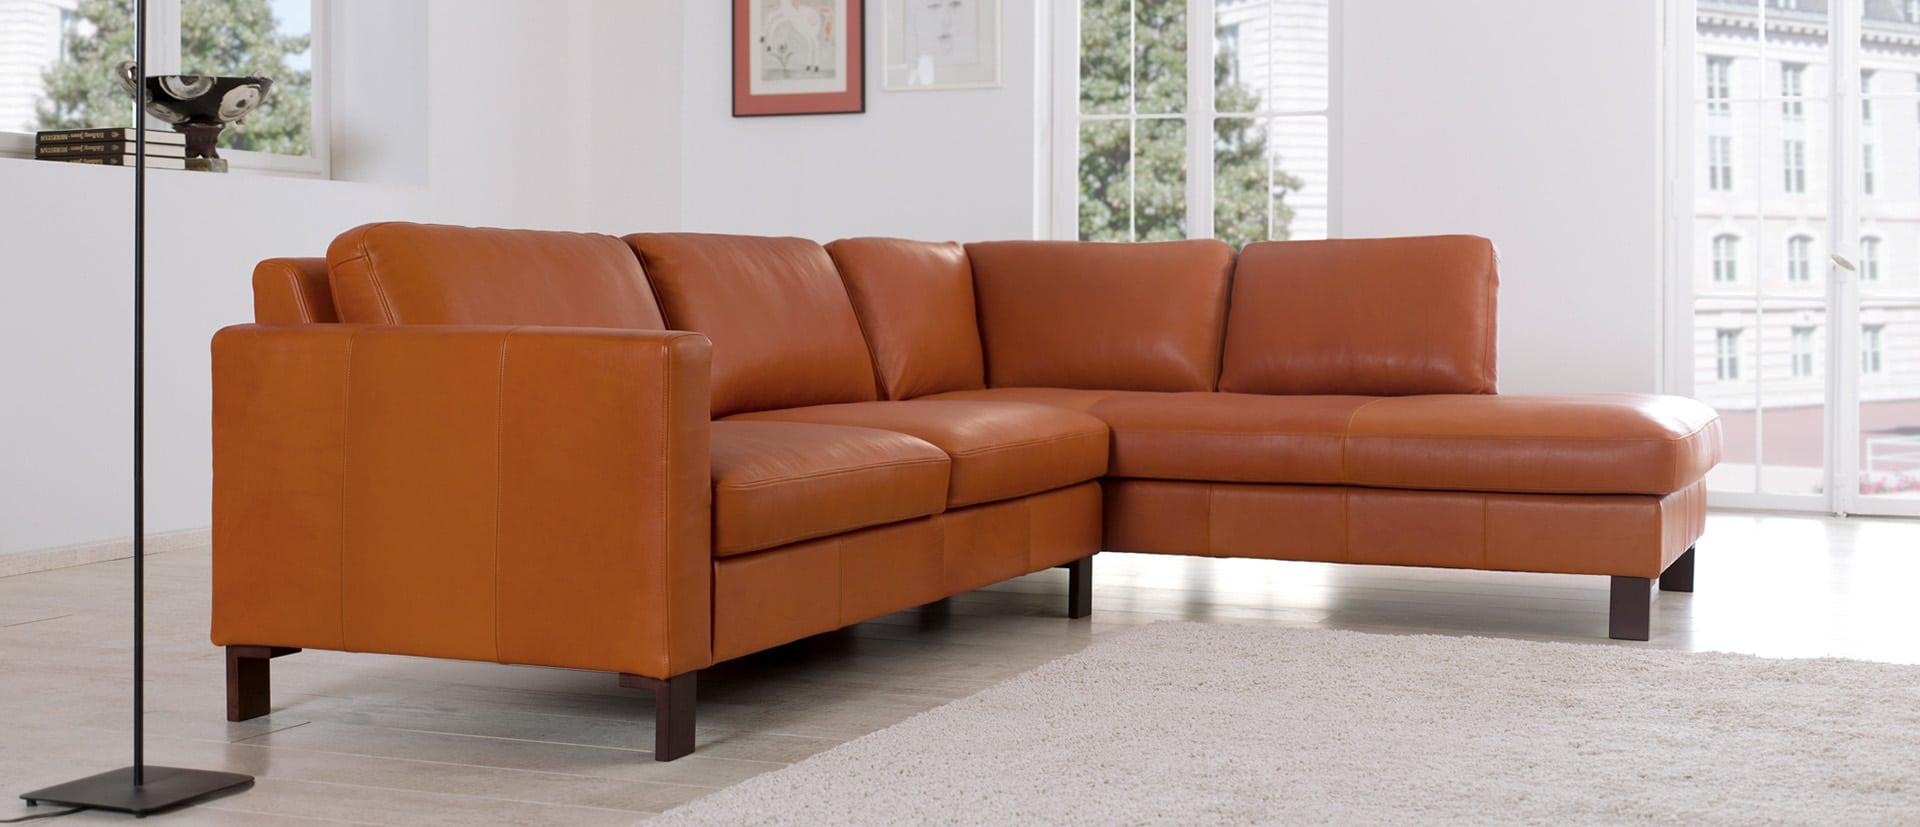 Full Size of Leder Sofa Ikea Ledersofa Schweiz 3er Couch Cognac Vintage Braun Echtleder Bed Design Set 3 Sitzer Kaufen Schwarz Designer 2 Weiss Gebraucht Rot Ledersofas Mit Sofa Leder Sofa